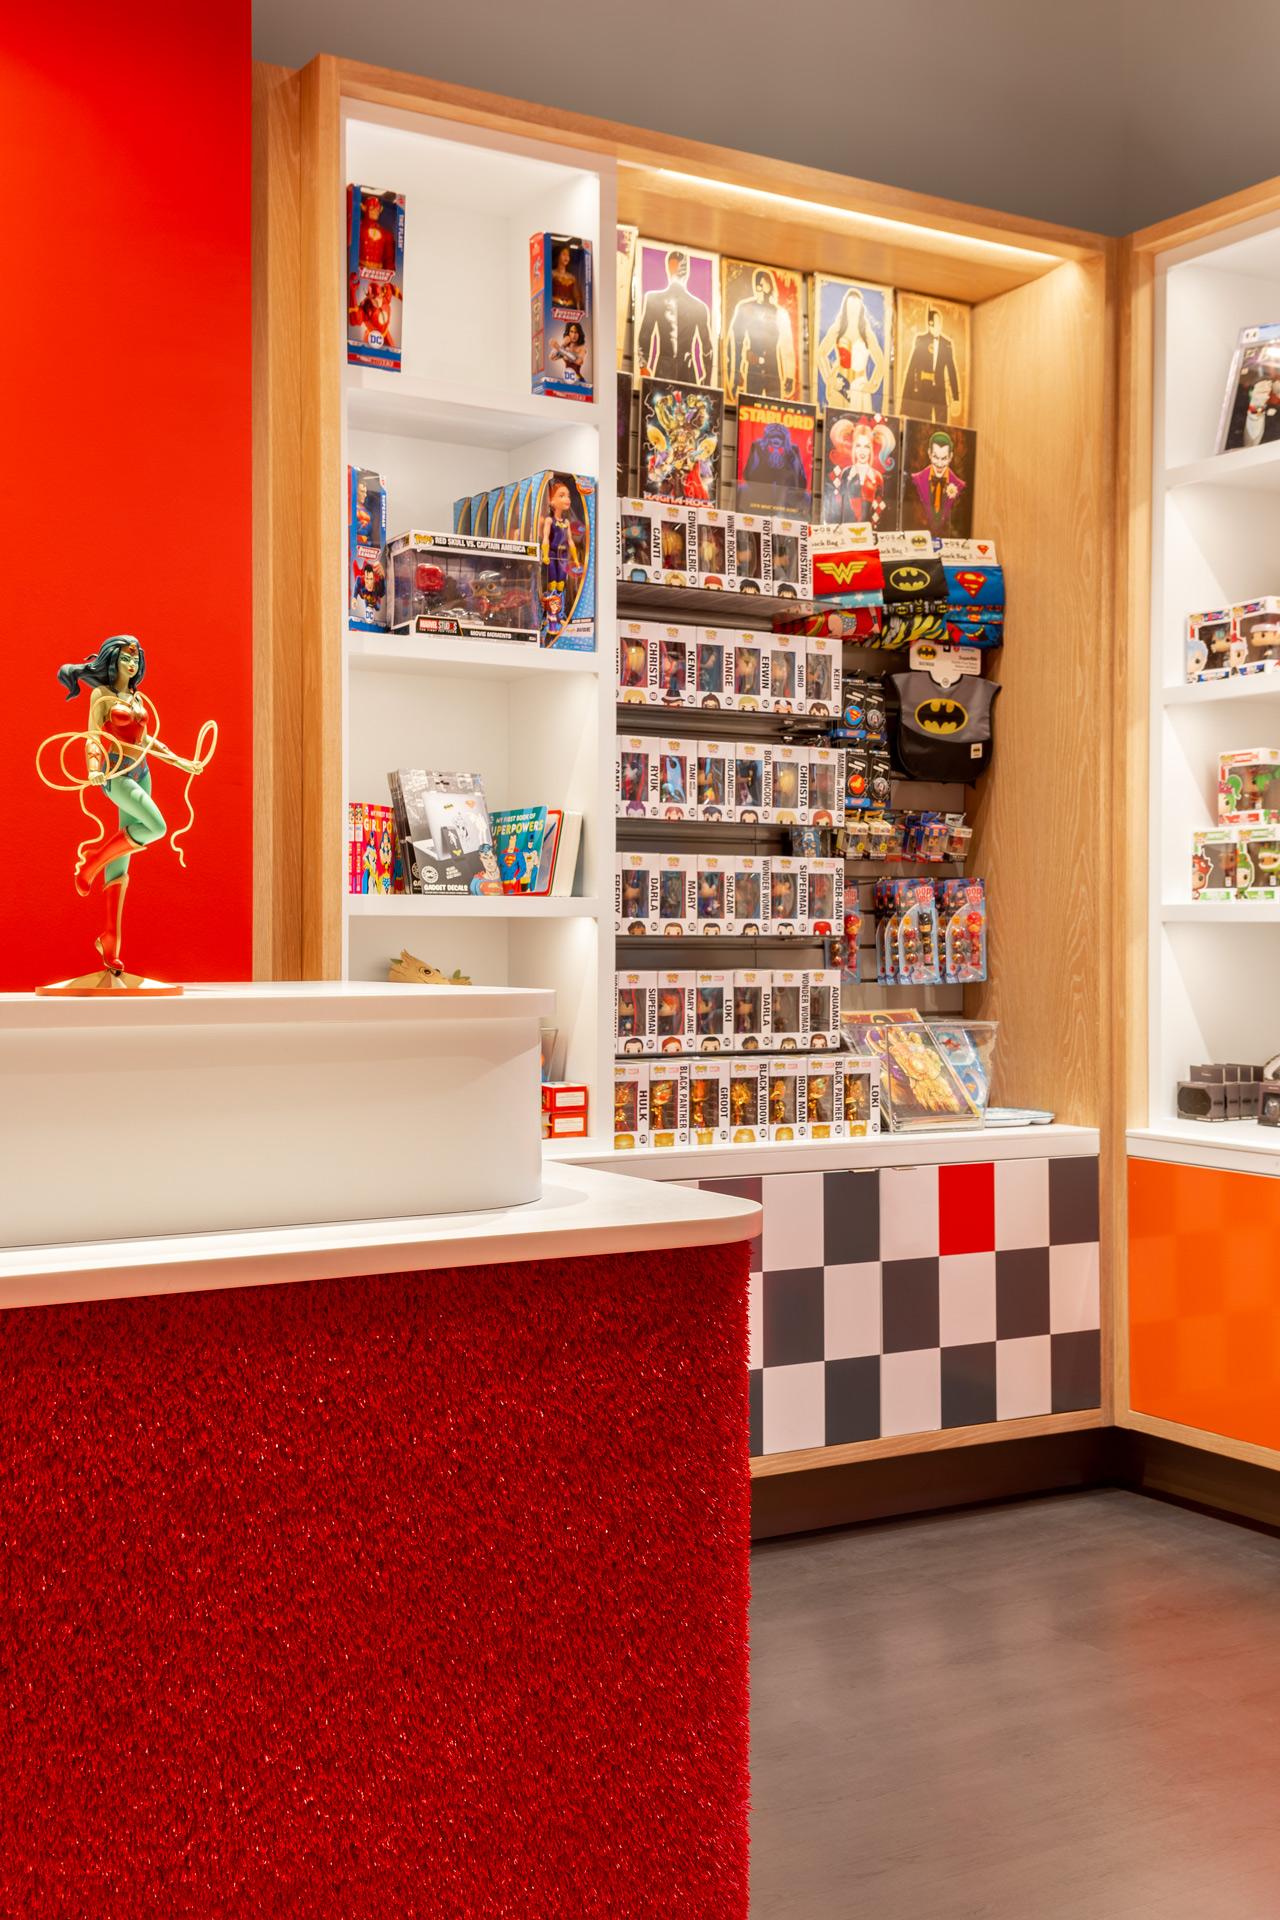 PiQ Hudson Yards retail store designer